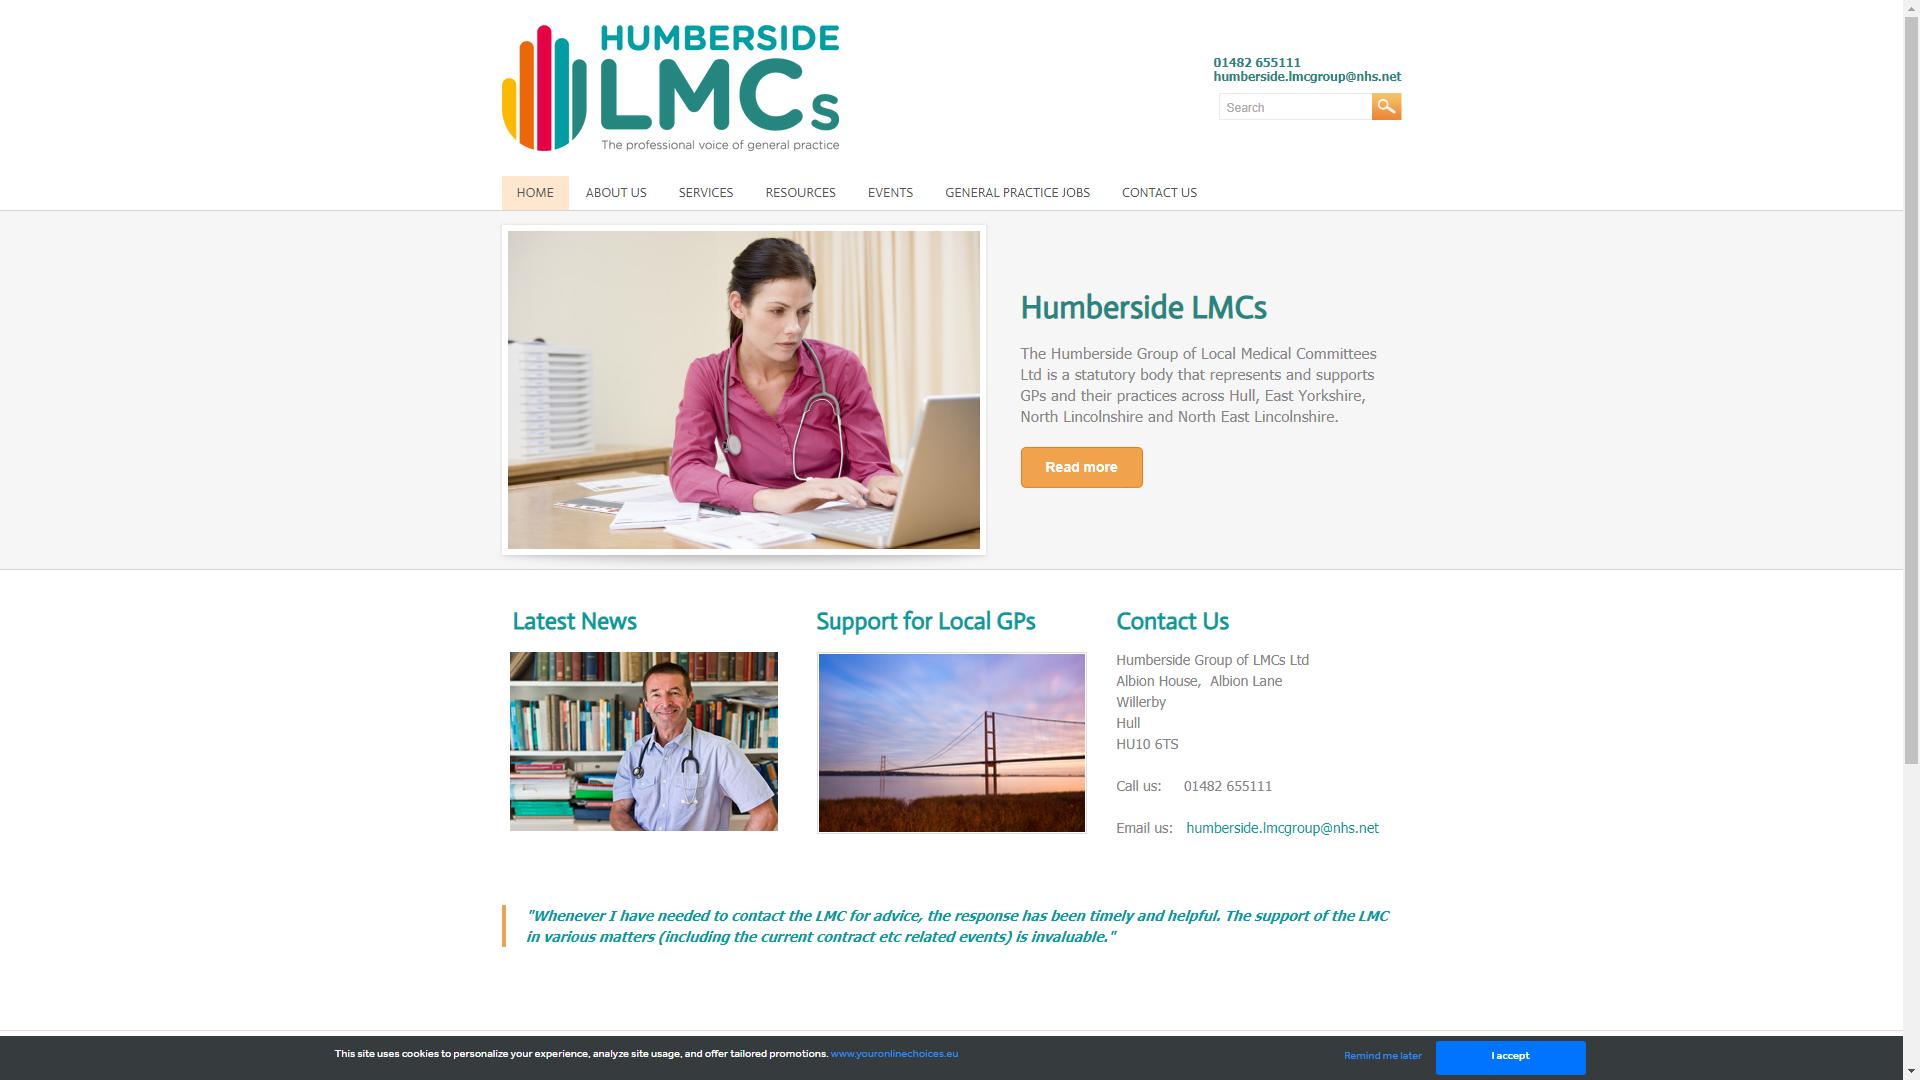 Humberside LMC